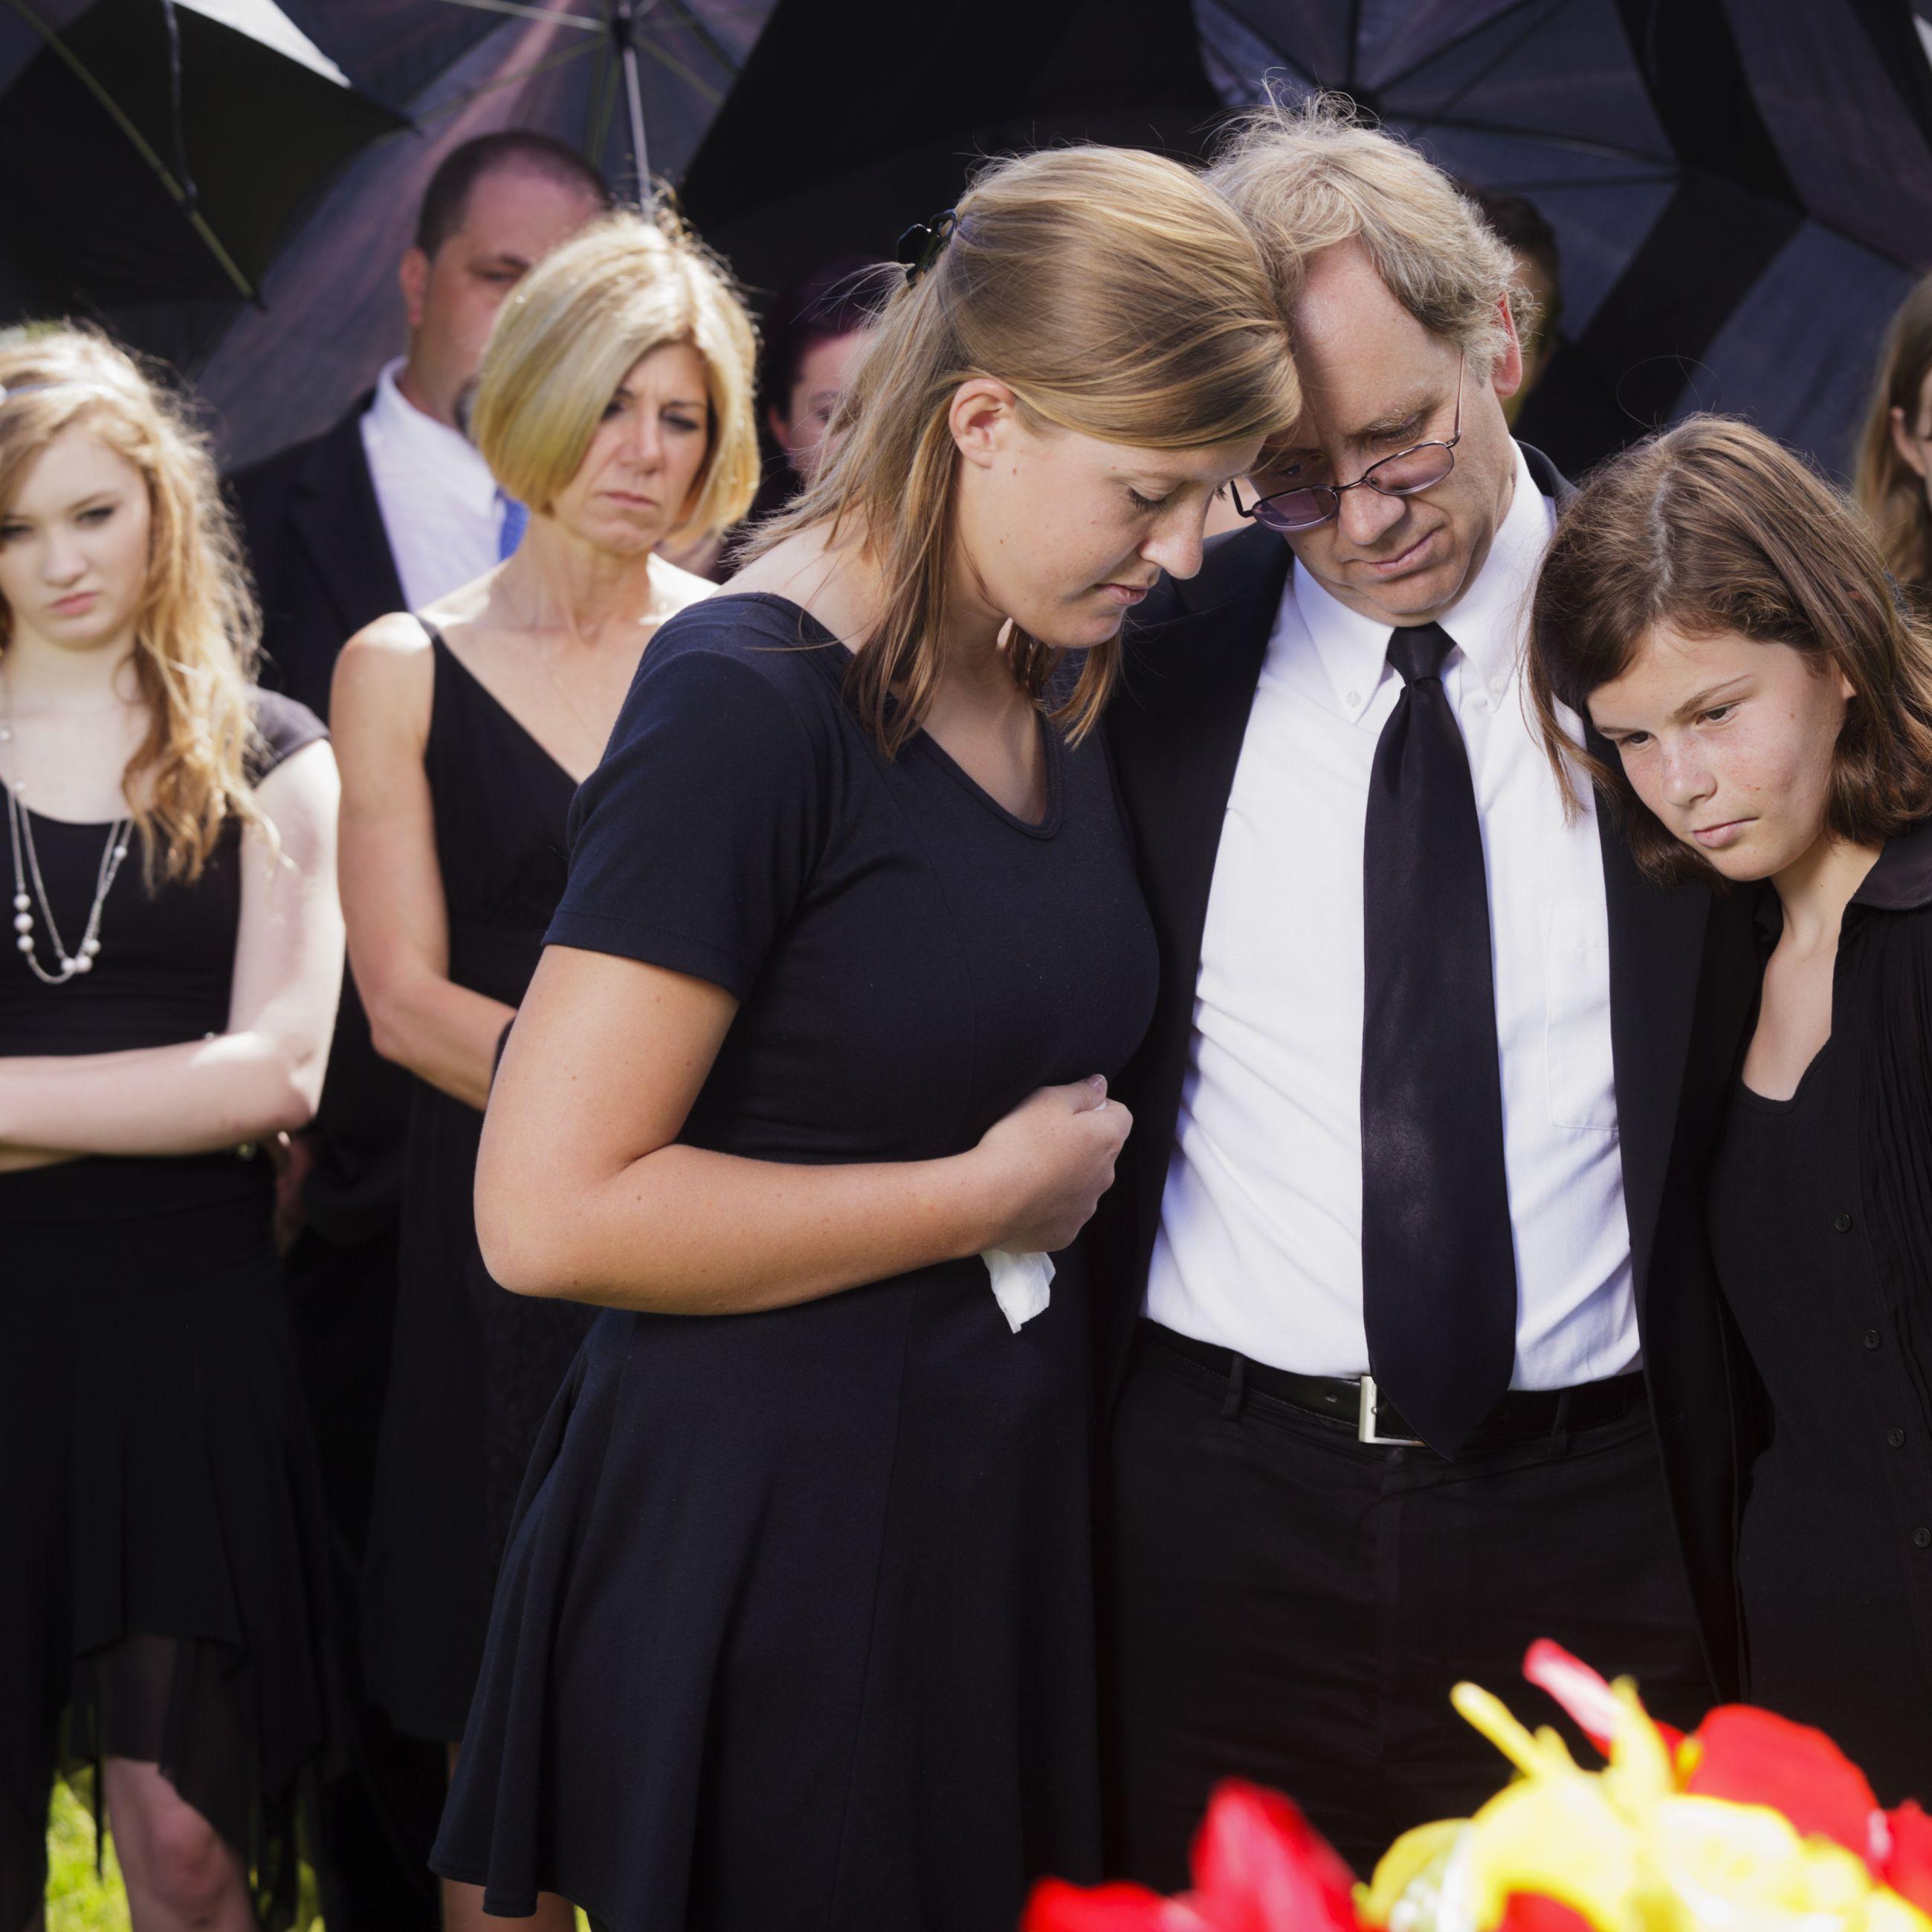 Widowed father raising daughter